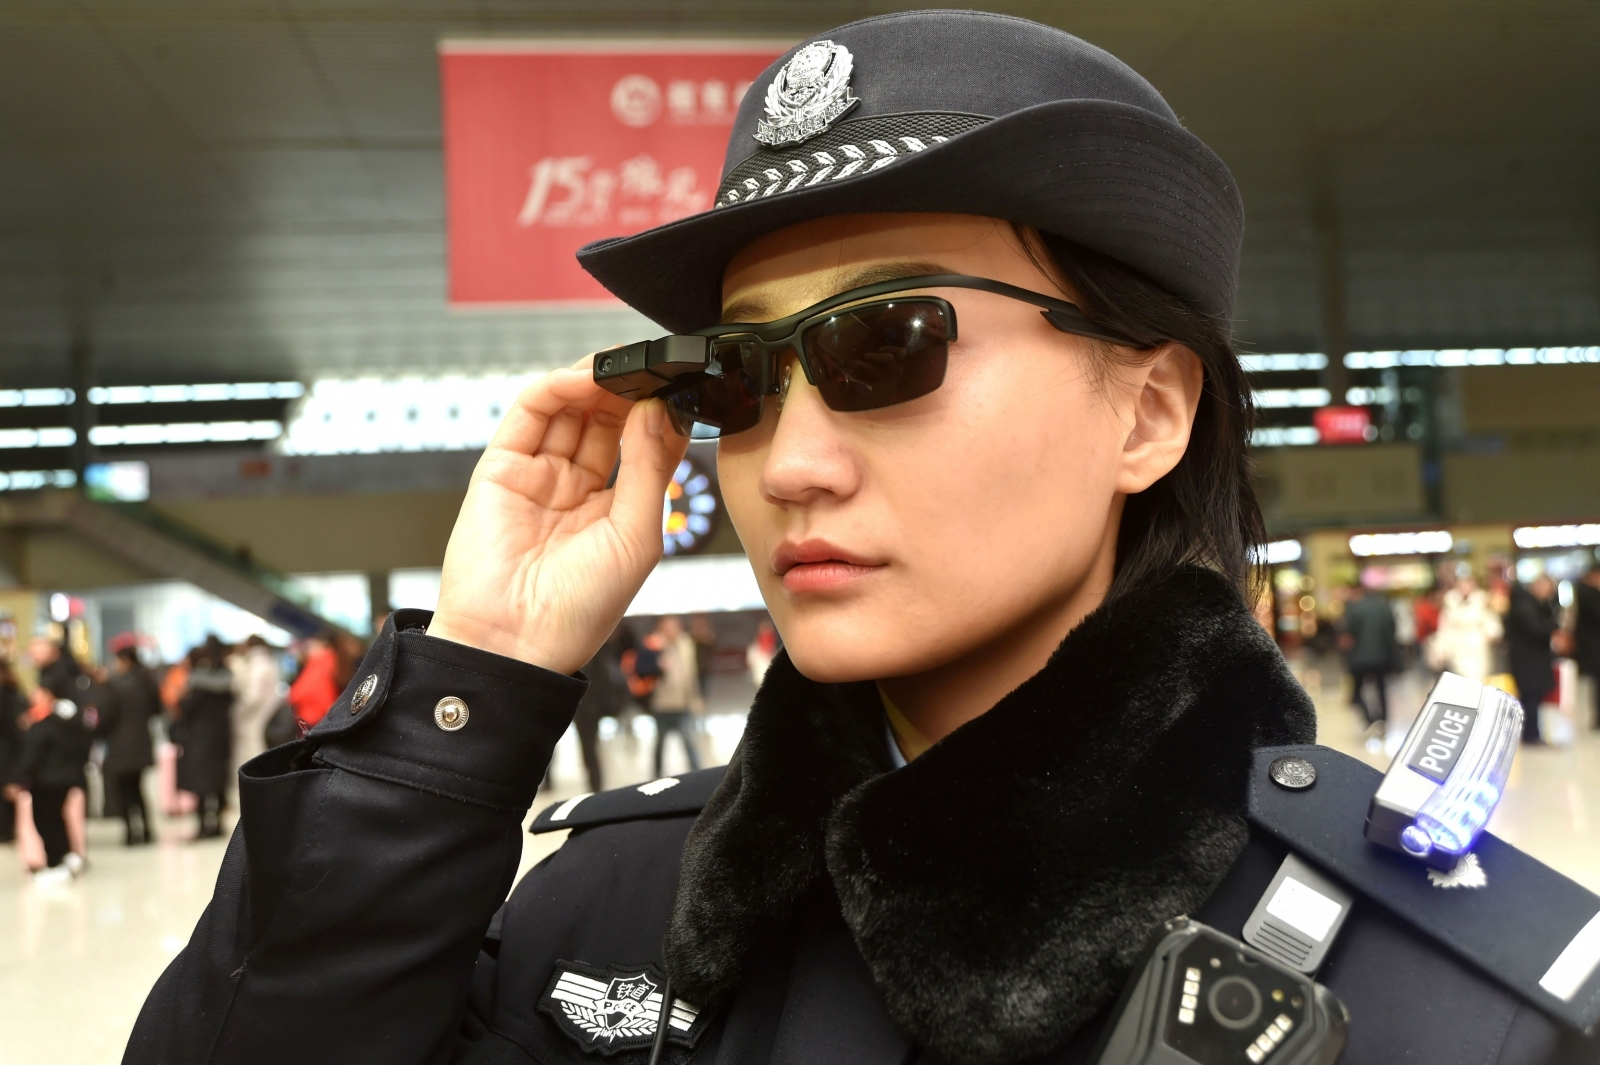 China police using smartglasses